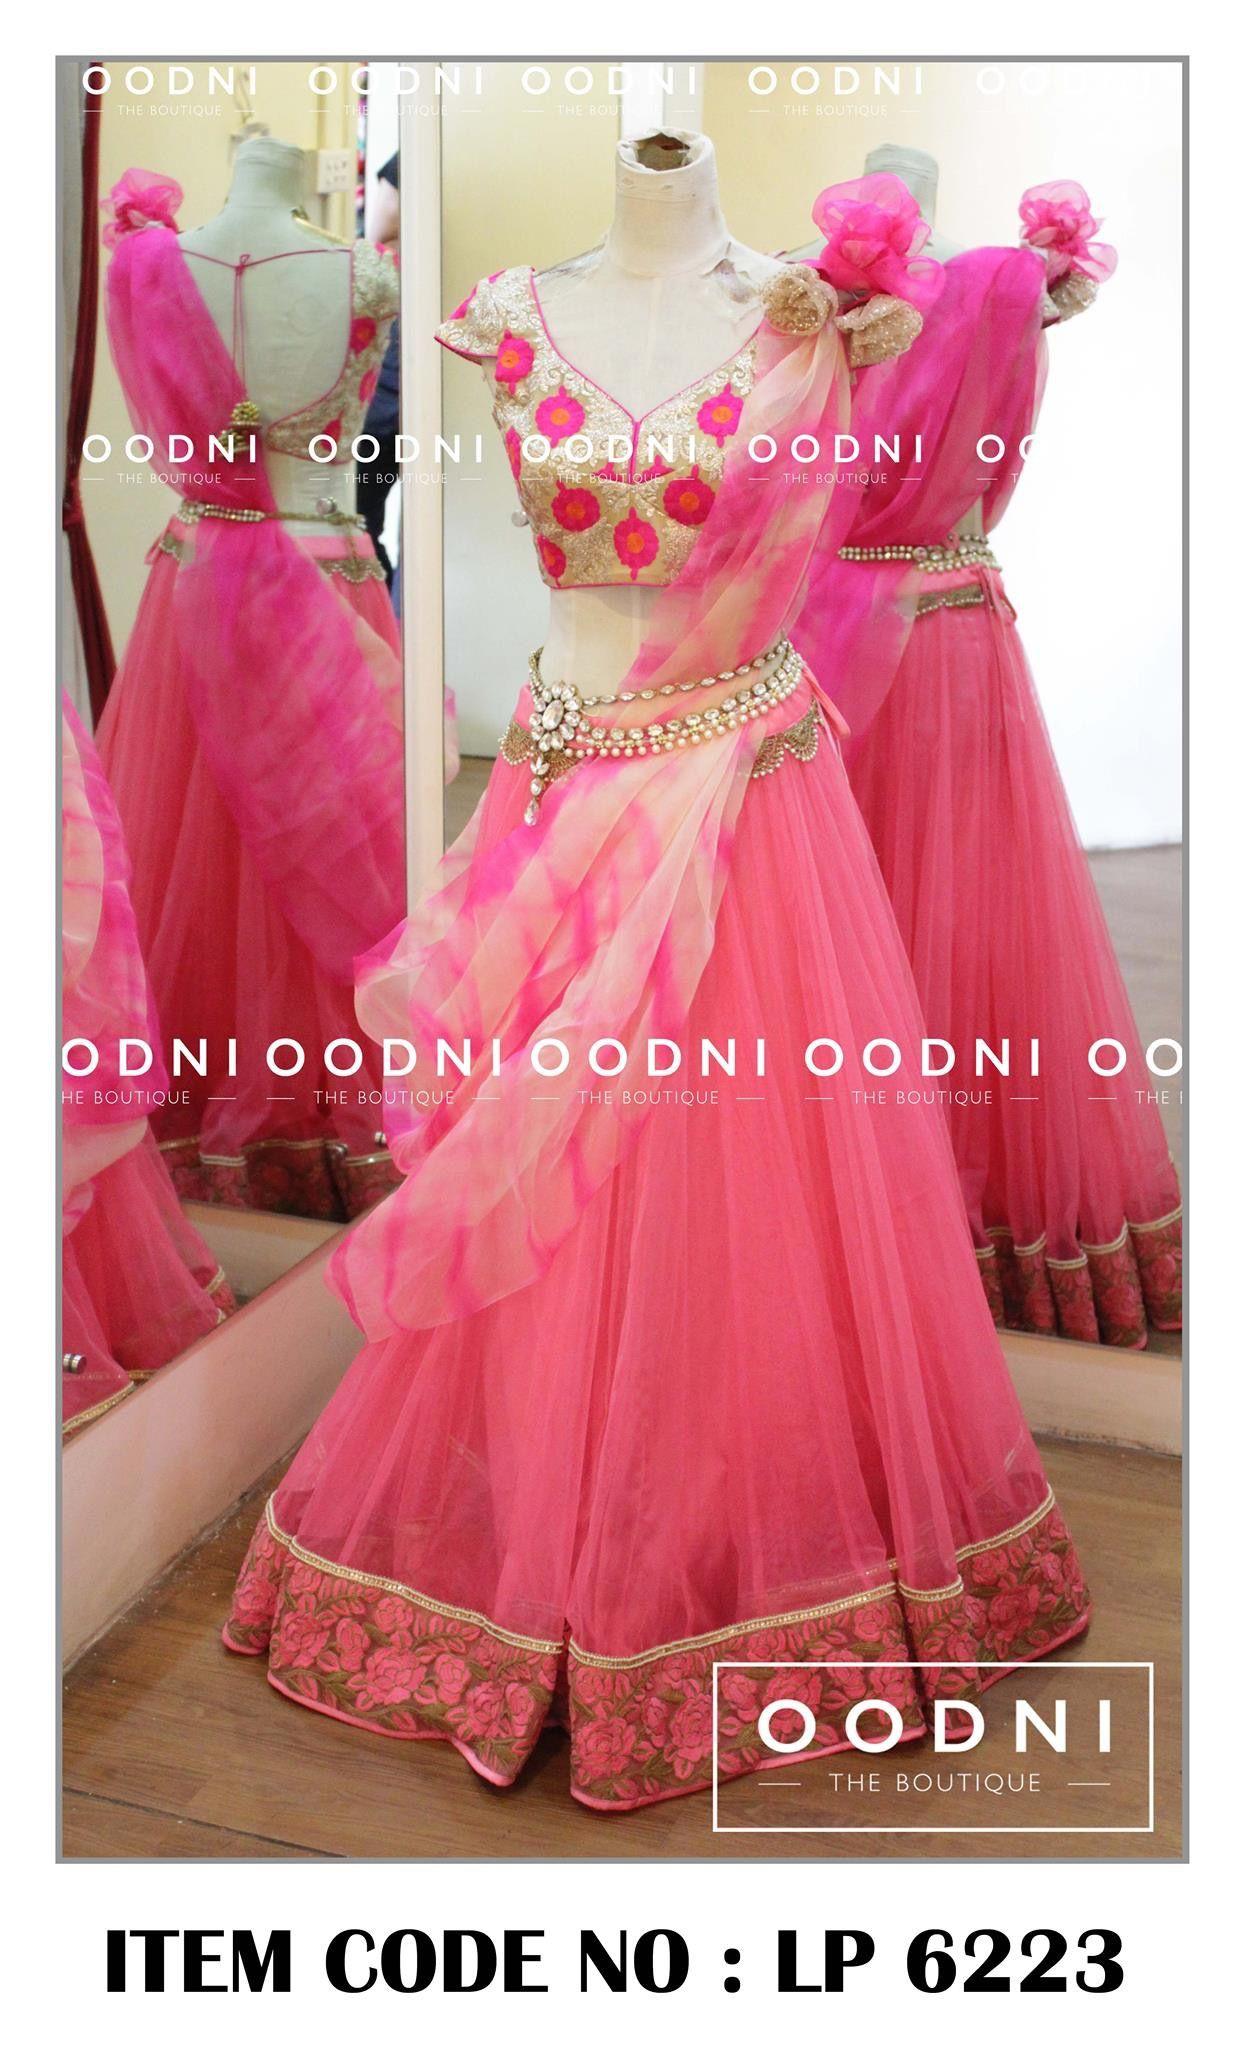 Pin de Aarti Kadam en Indian Wedding | Pinterest | Vestuarios y ...